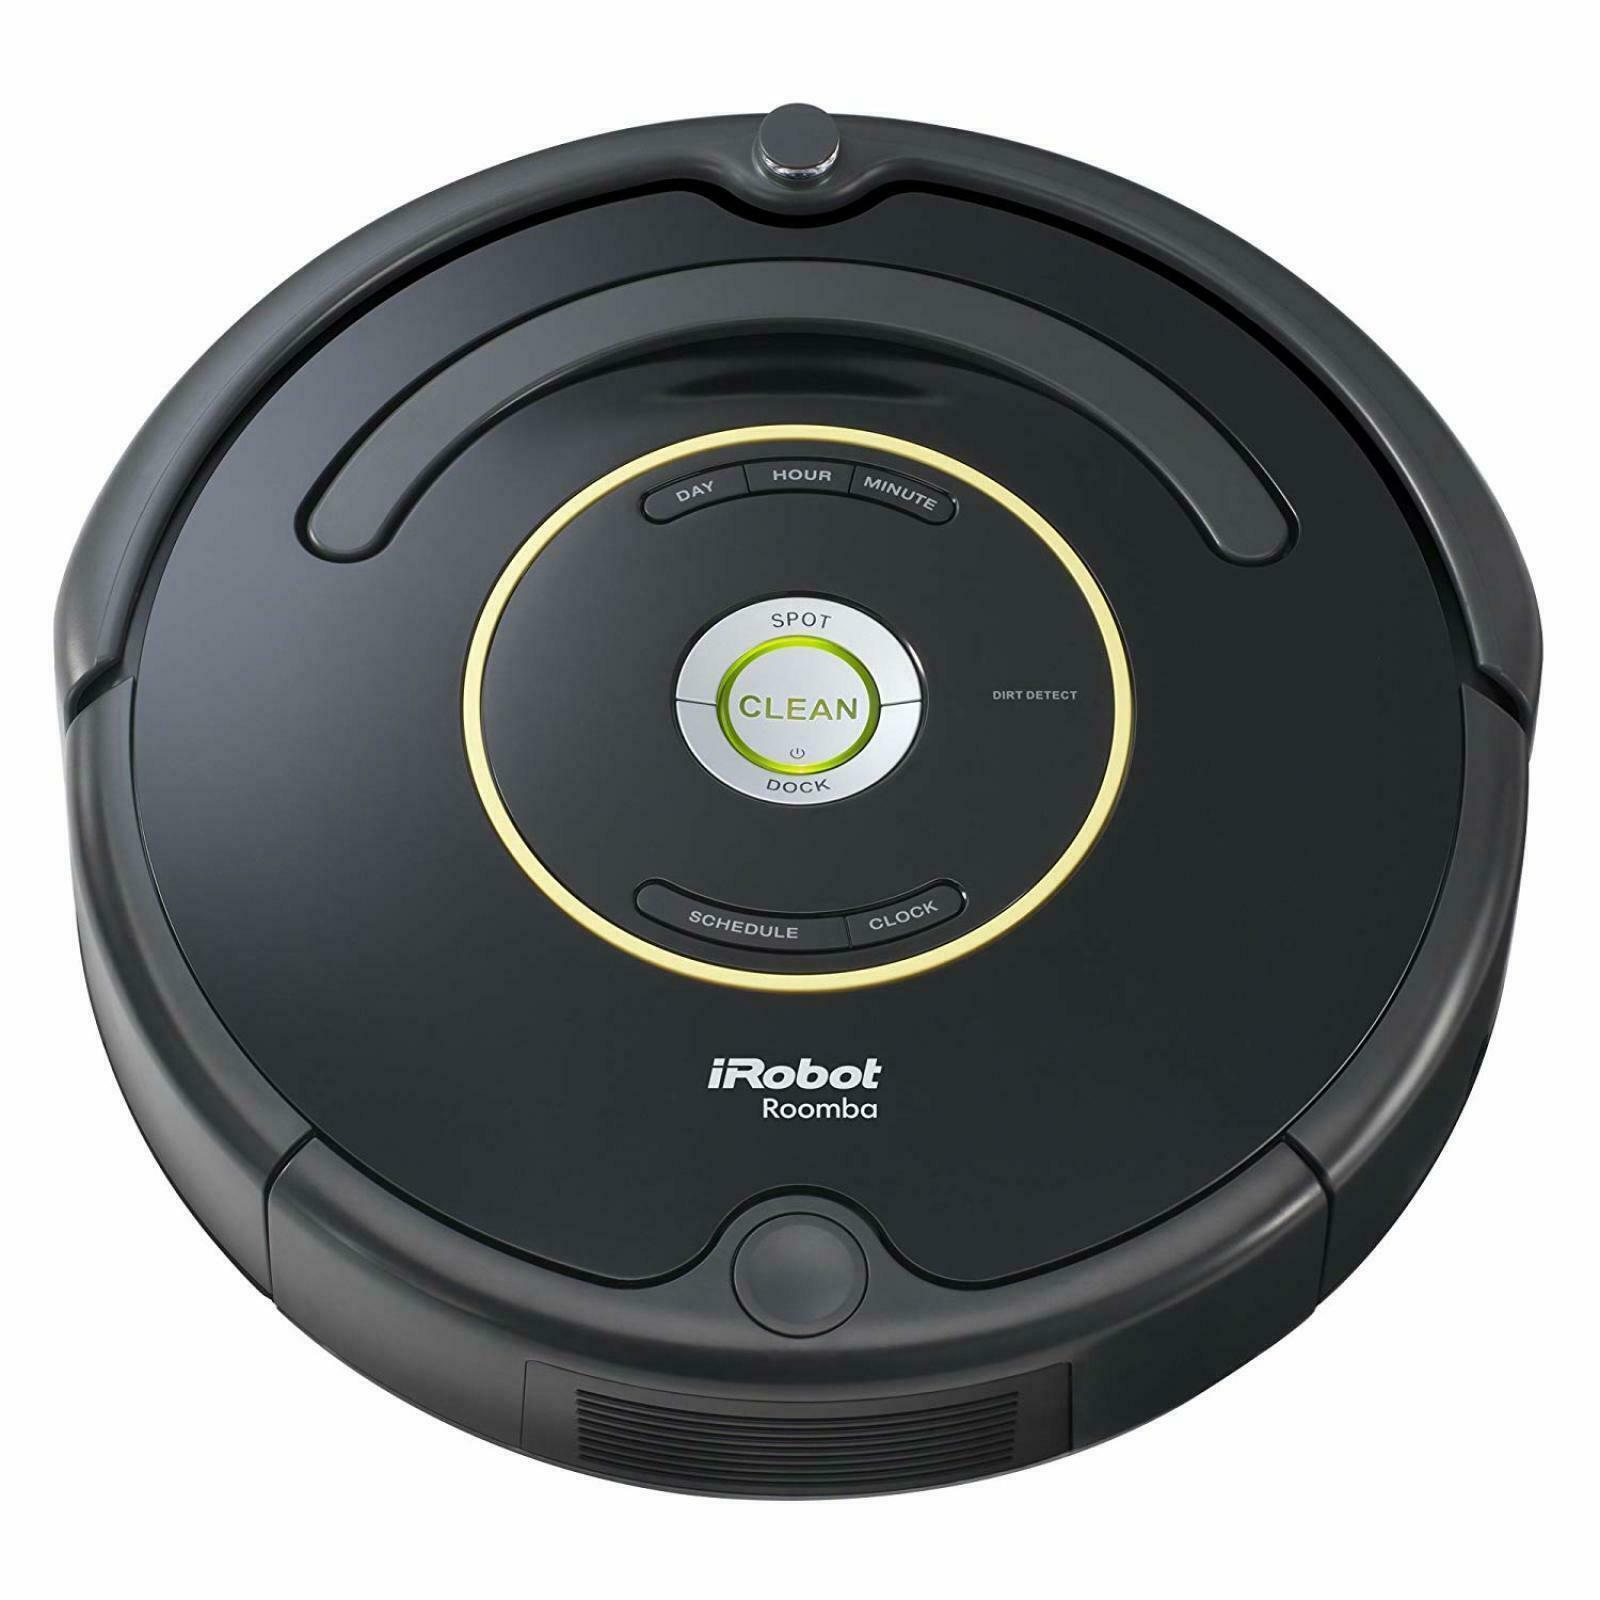 Prezzo Roomba 620.Irobot Roomba 650 Wi Fi Vacuum Cleaning Robot With Aerovac Bin Black